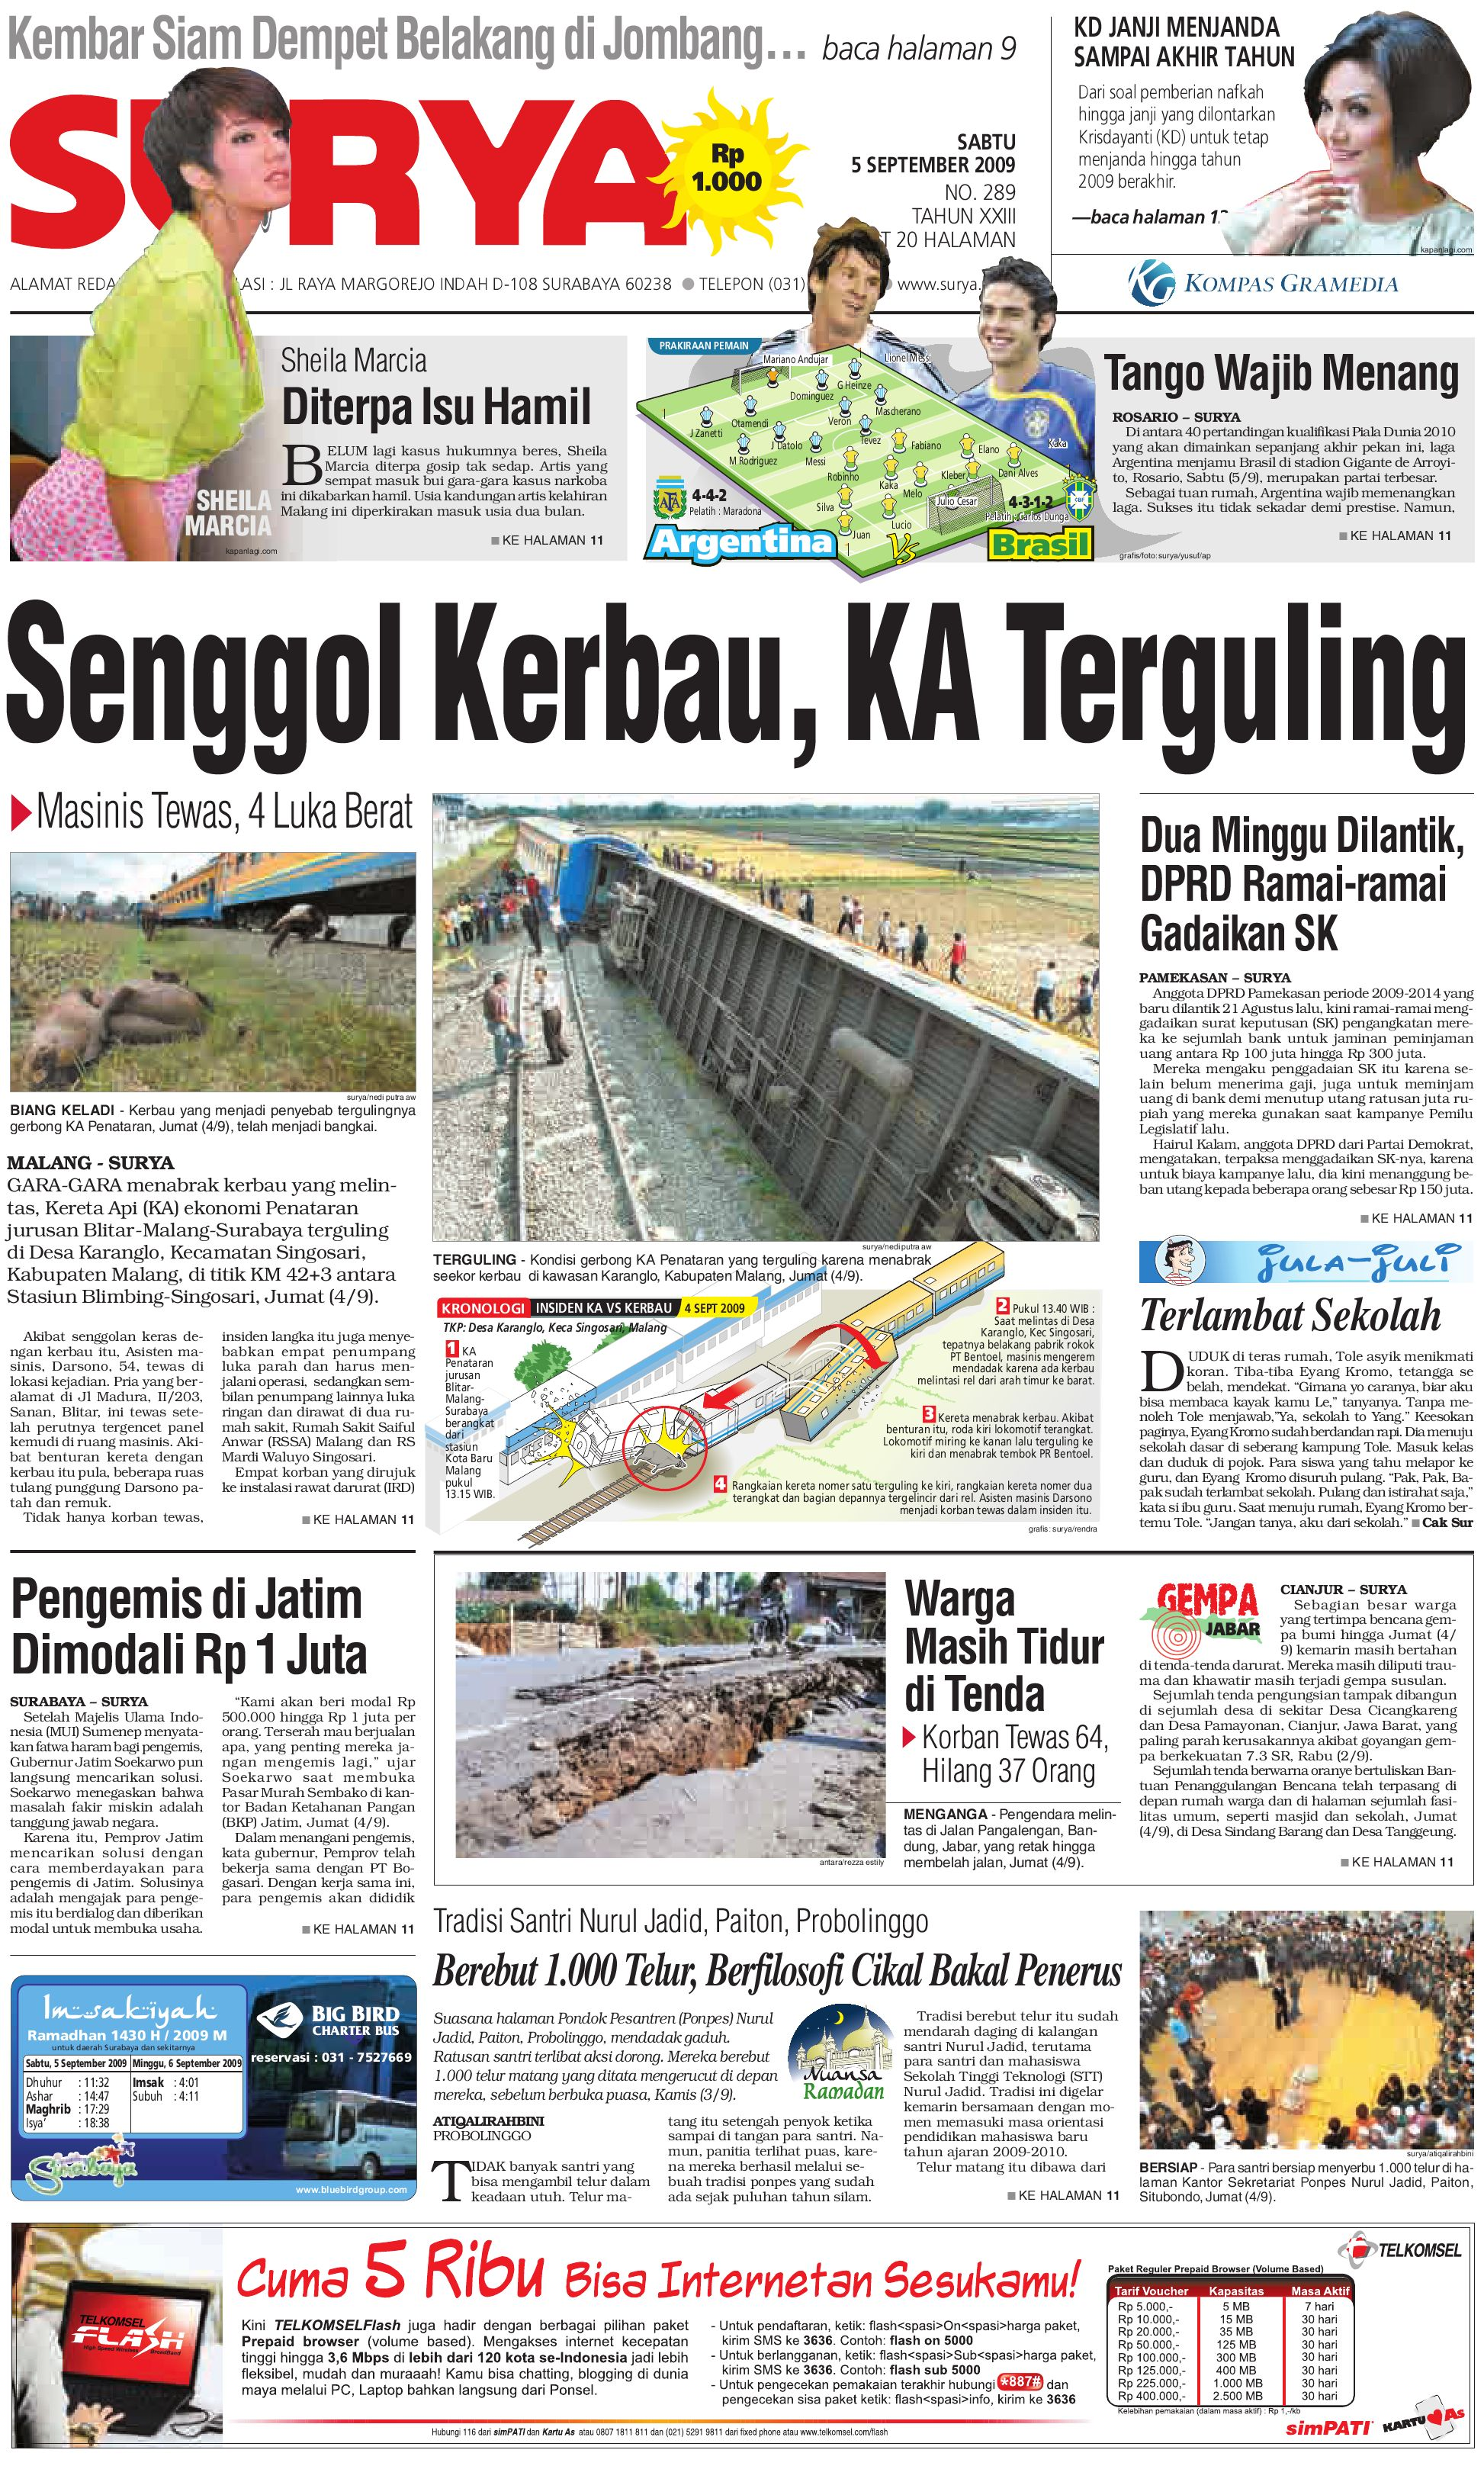 surya edisi cetak 05 sept 09 by harian surya issuu